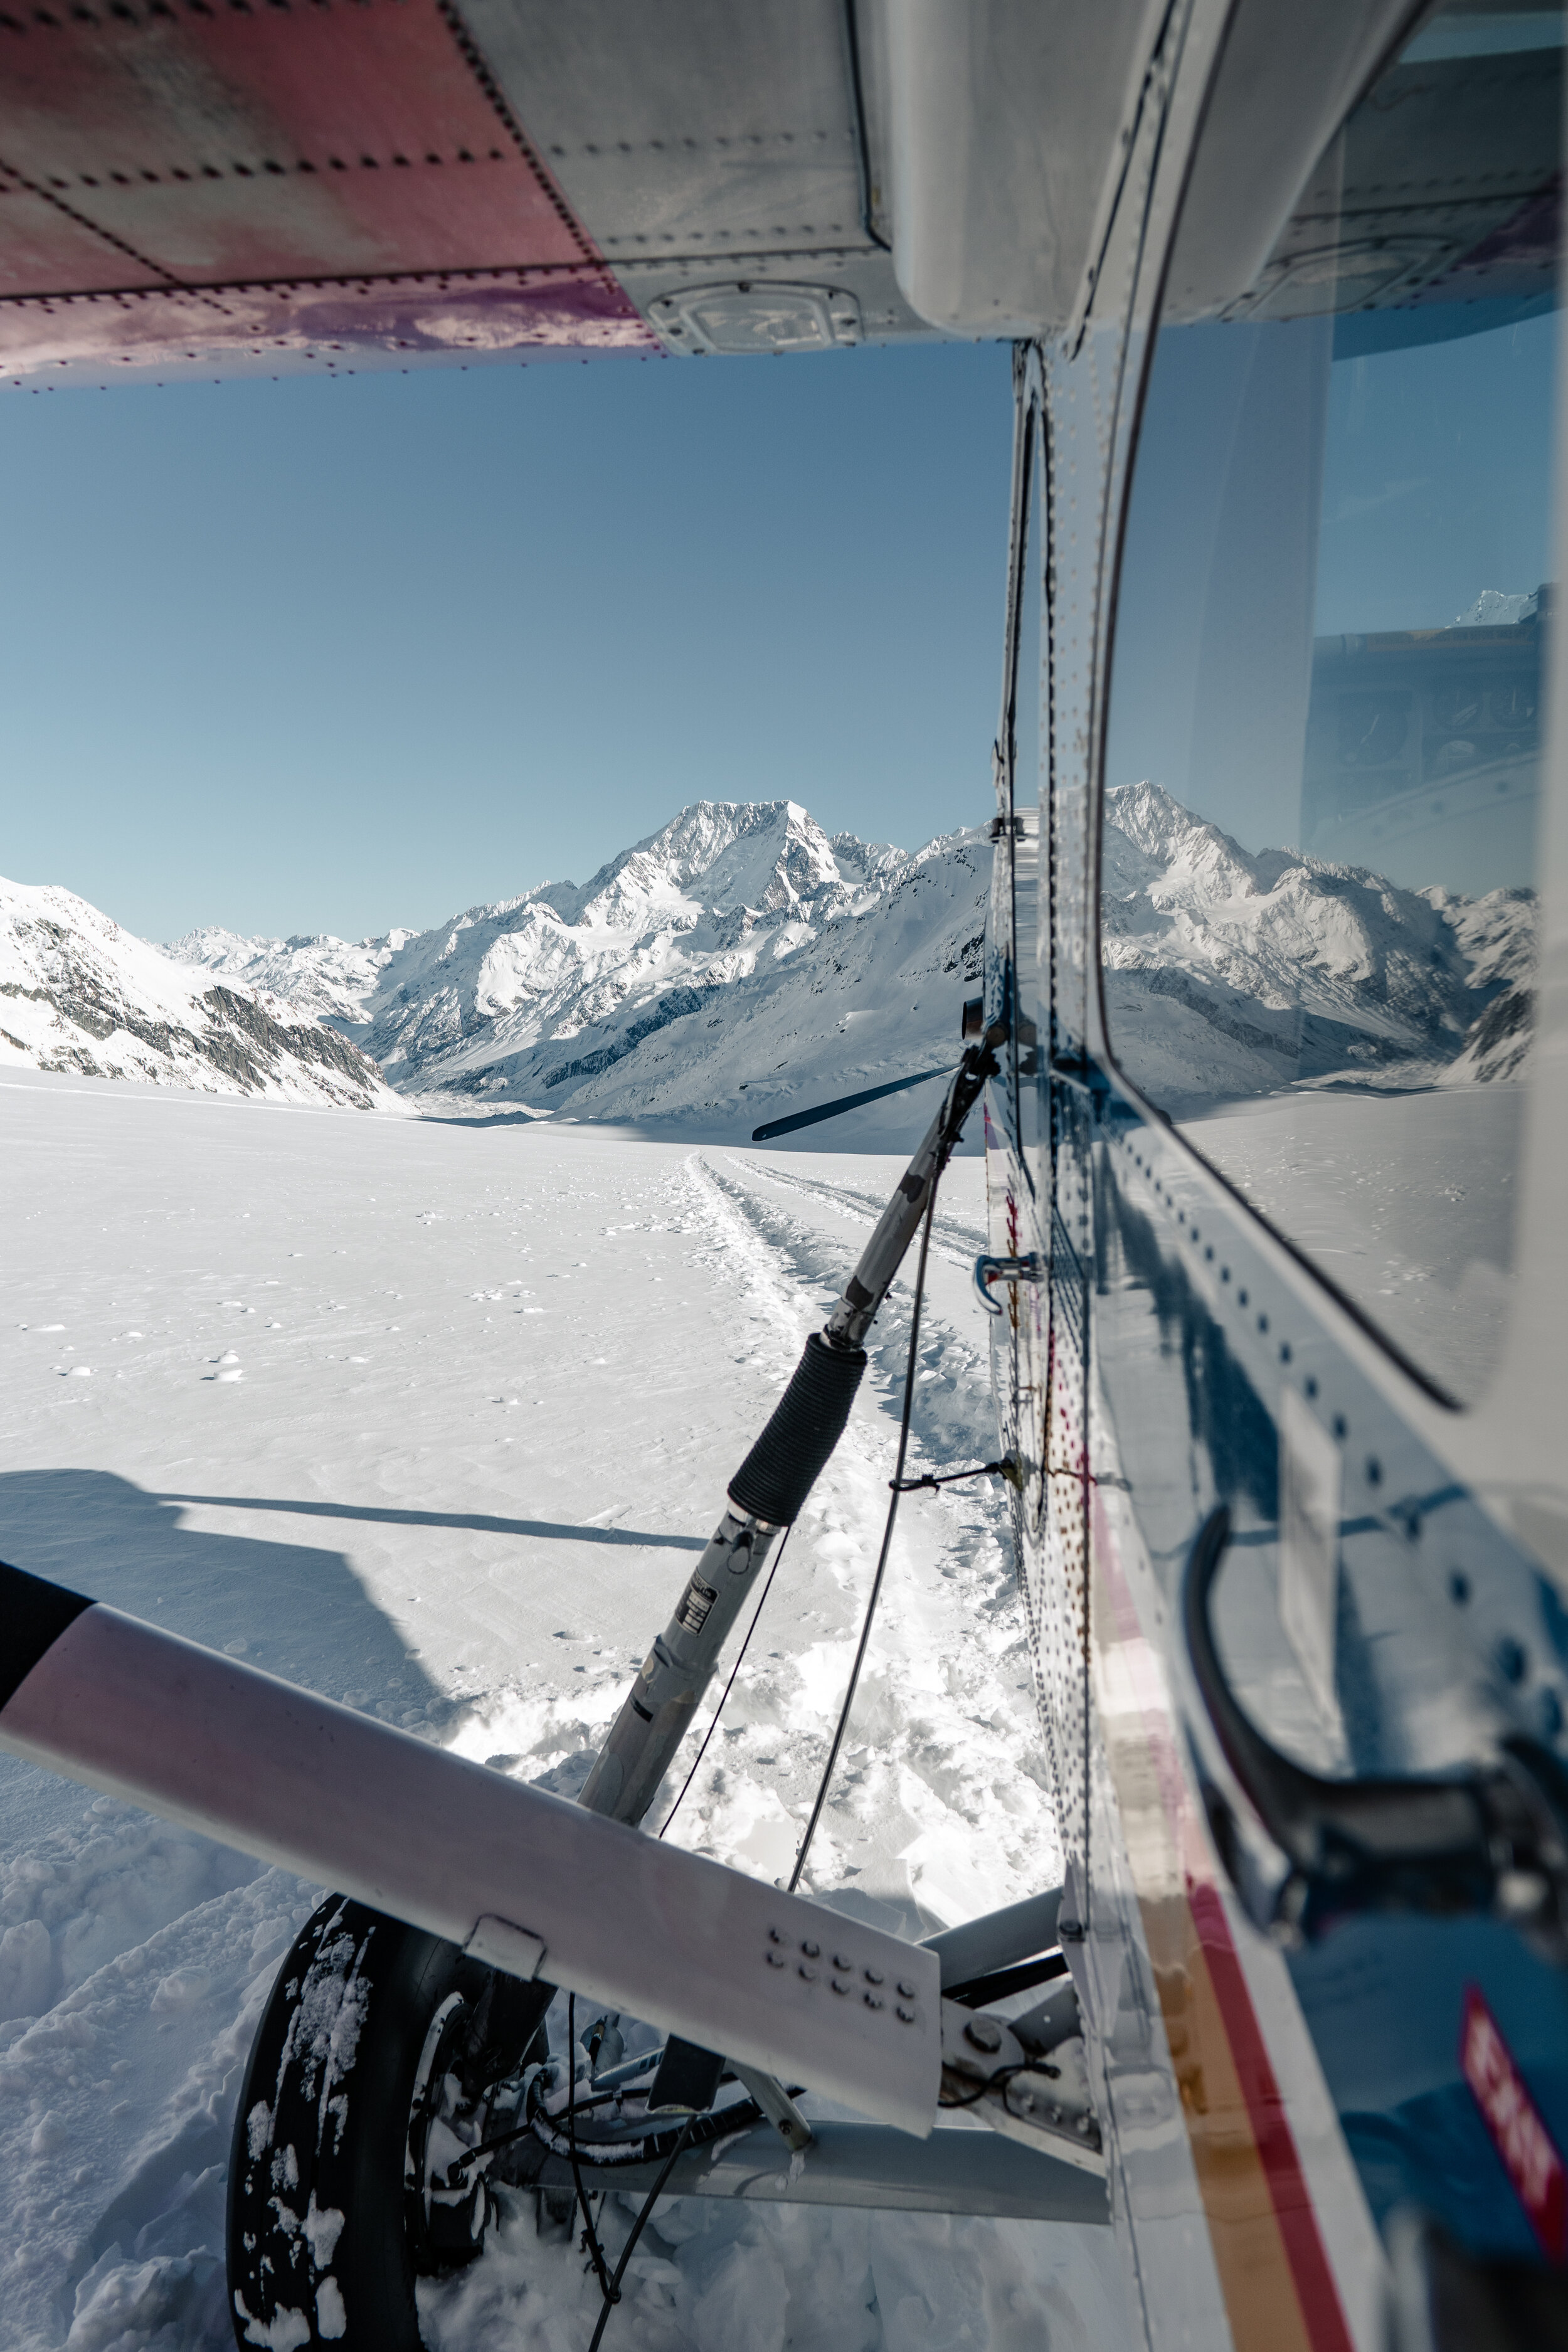 Mabey Ski_New Zealand_Mt Cook Ski Planes and Helicopters_Ski Plane on the Tasman Glacier_1.jpg